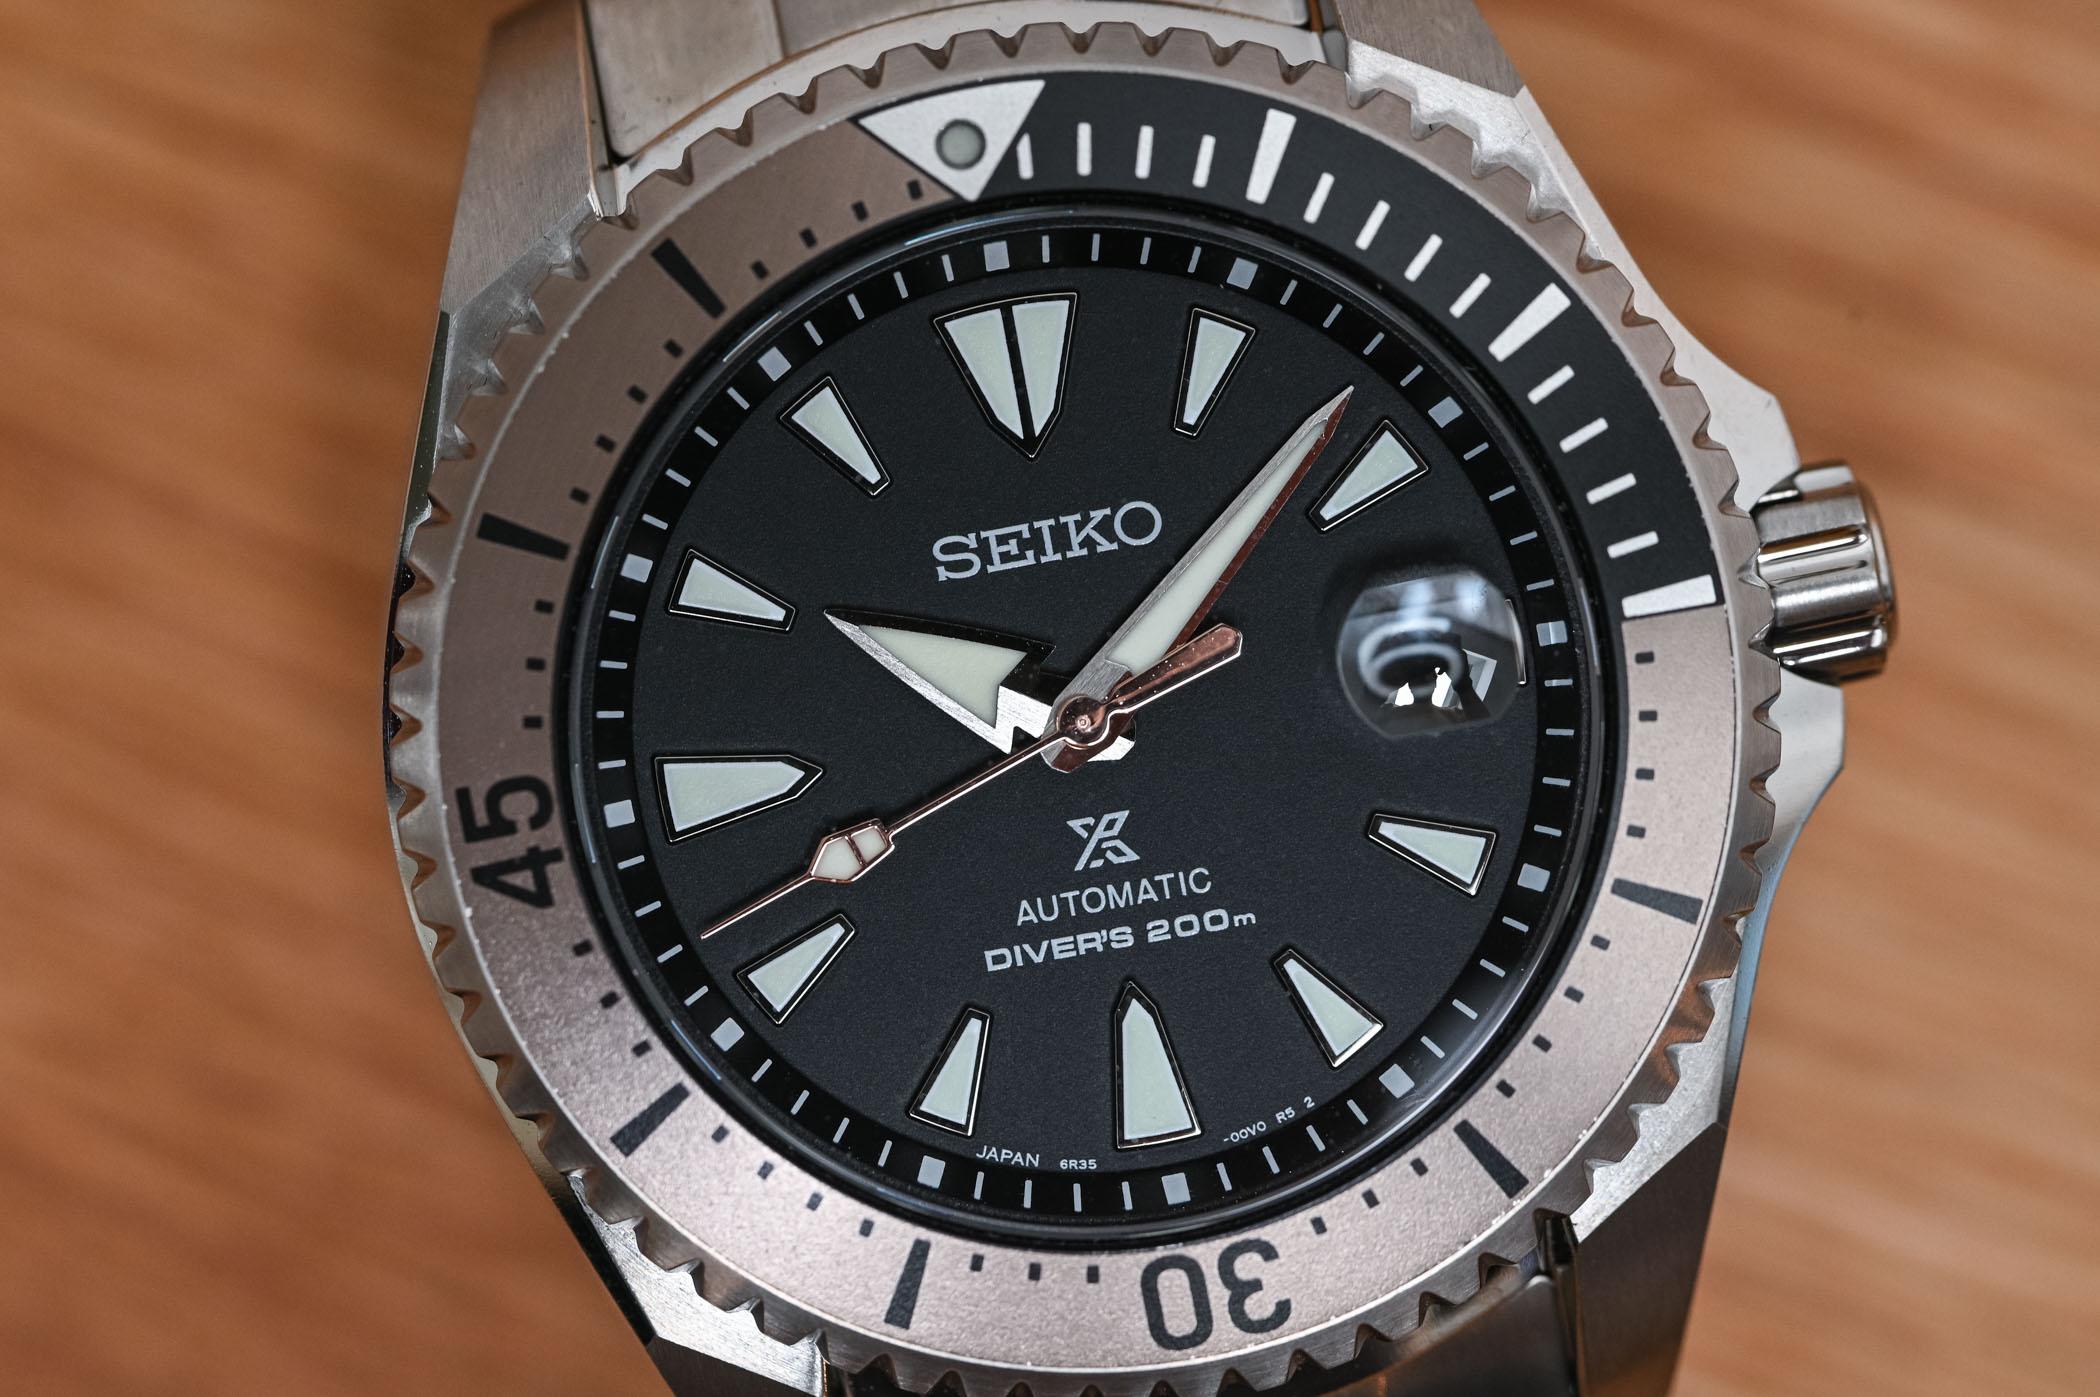 精工Prospex系列Diver 200m SPB189J1腕表